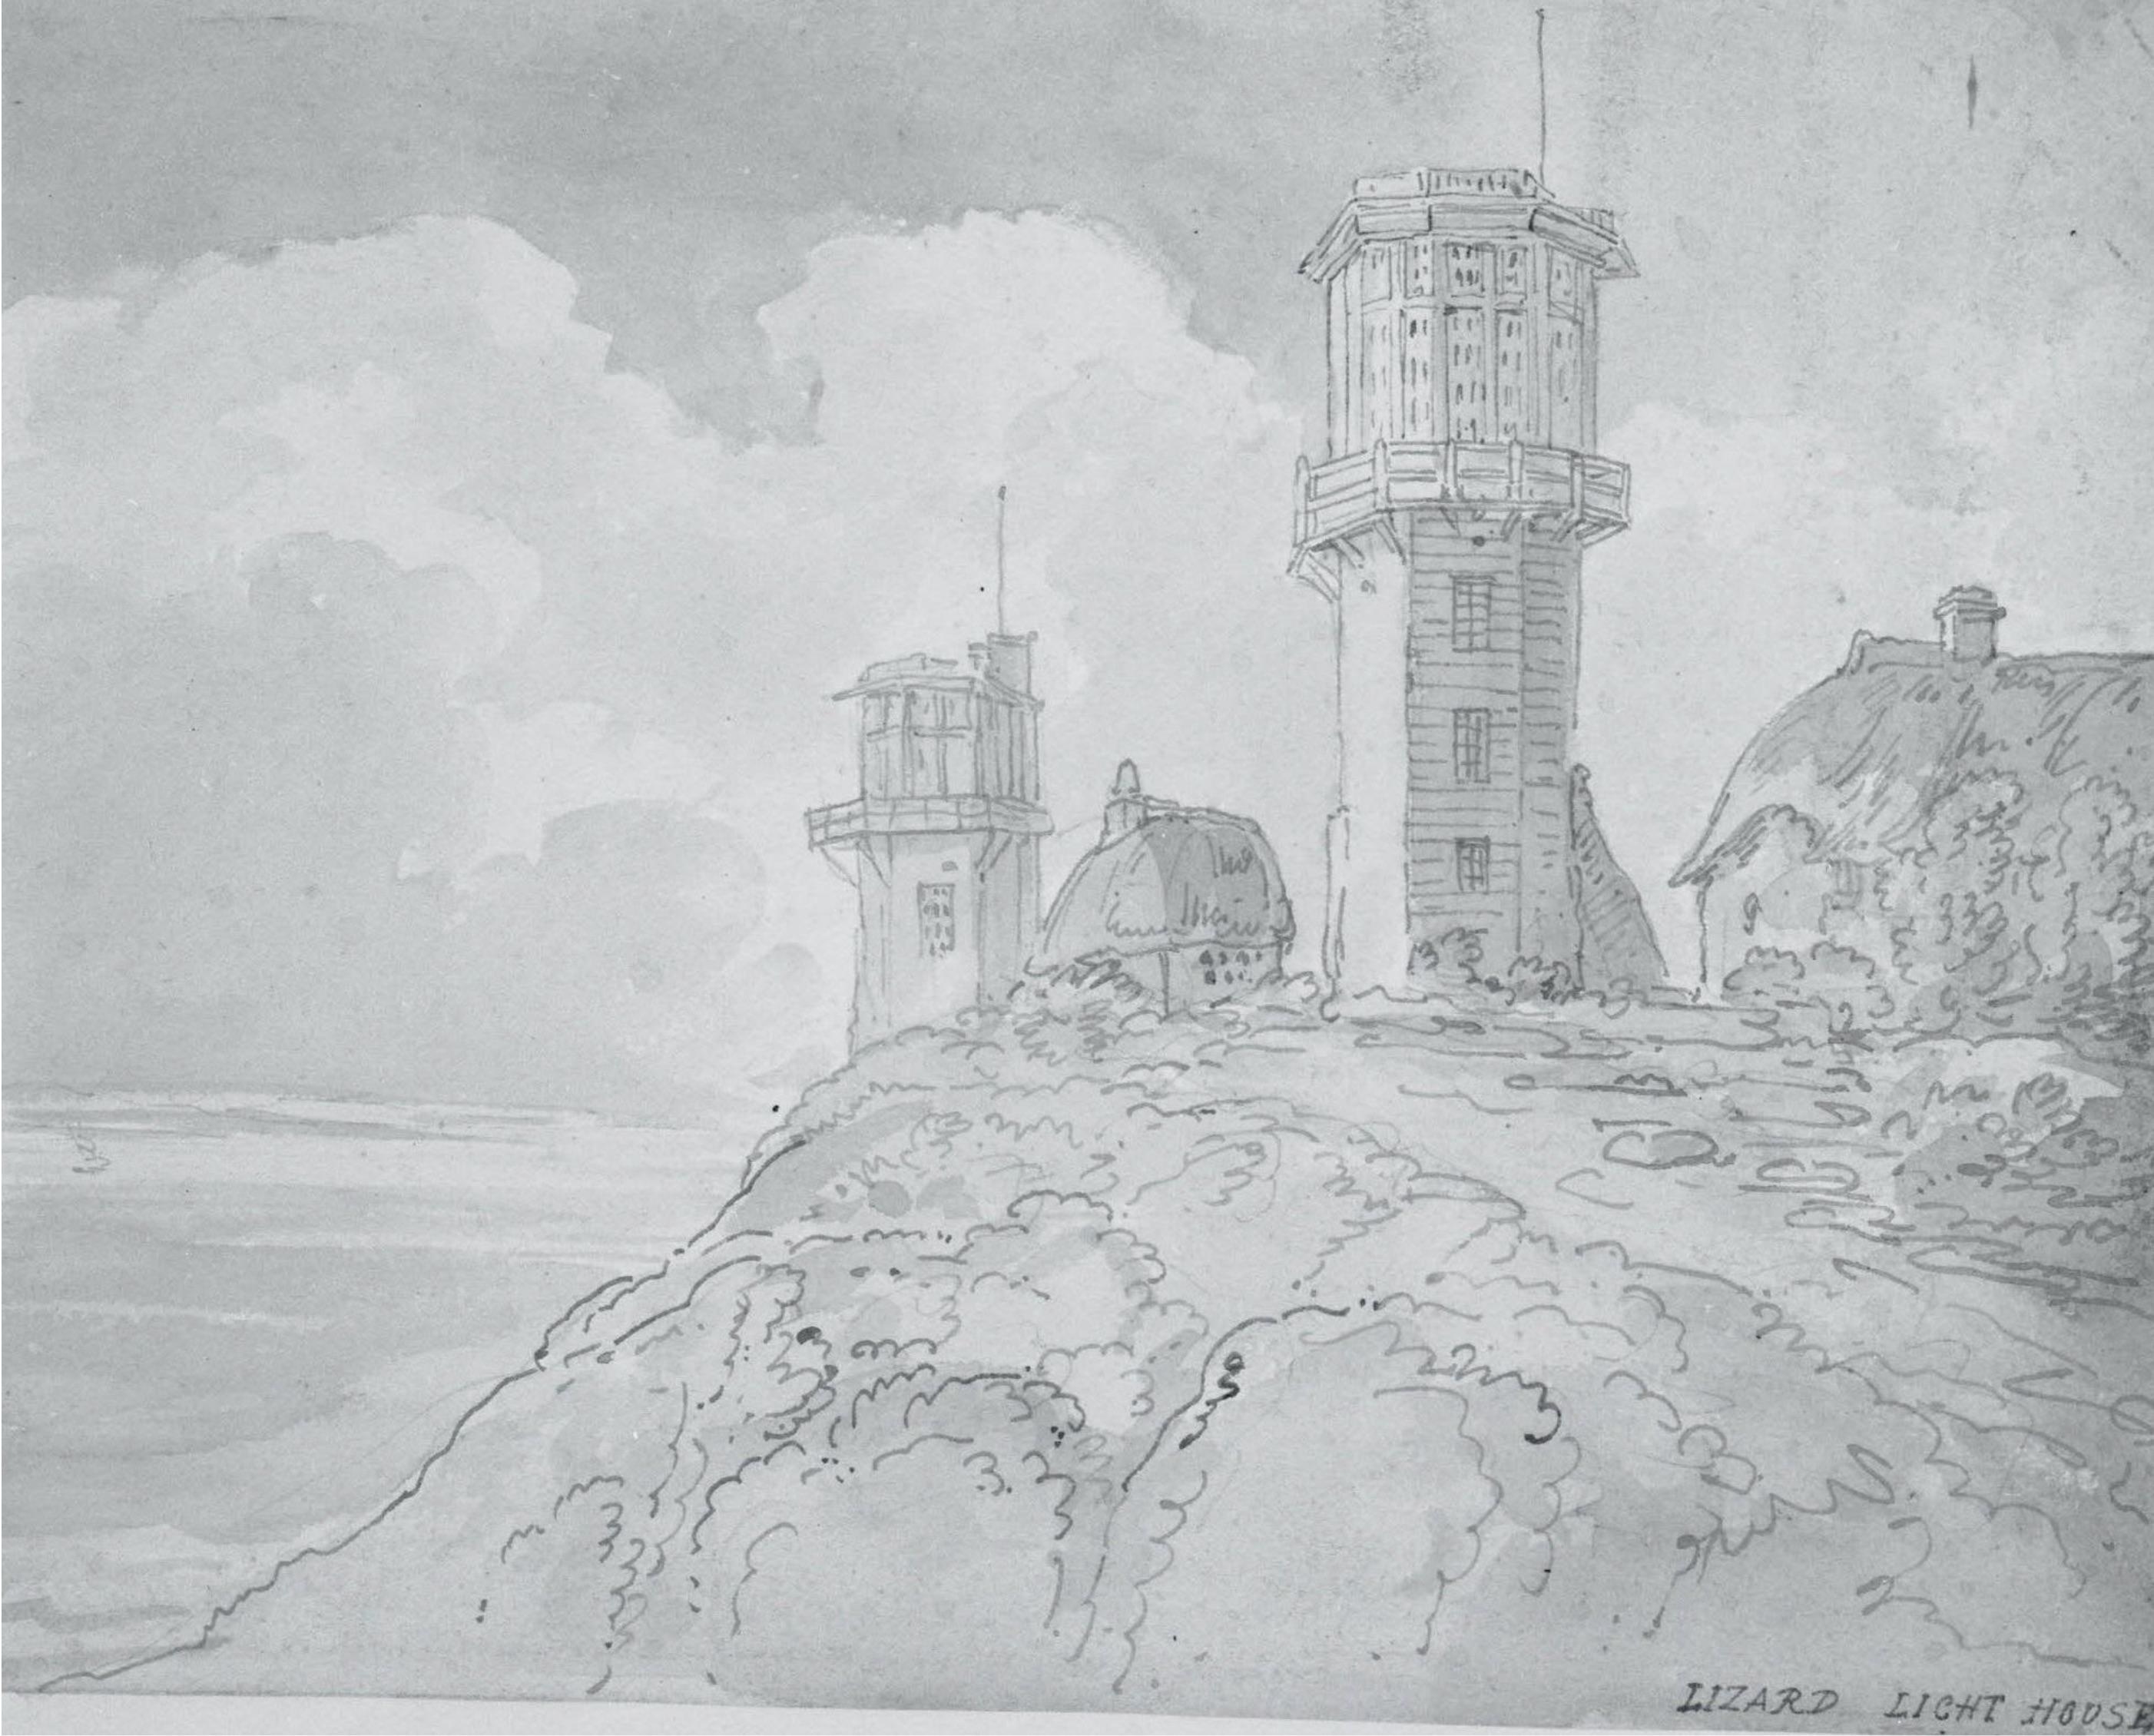 Lizard Light House 1772 - 1827 by T Rowlandson